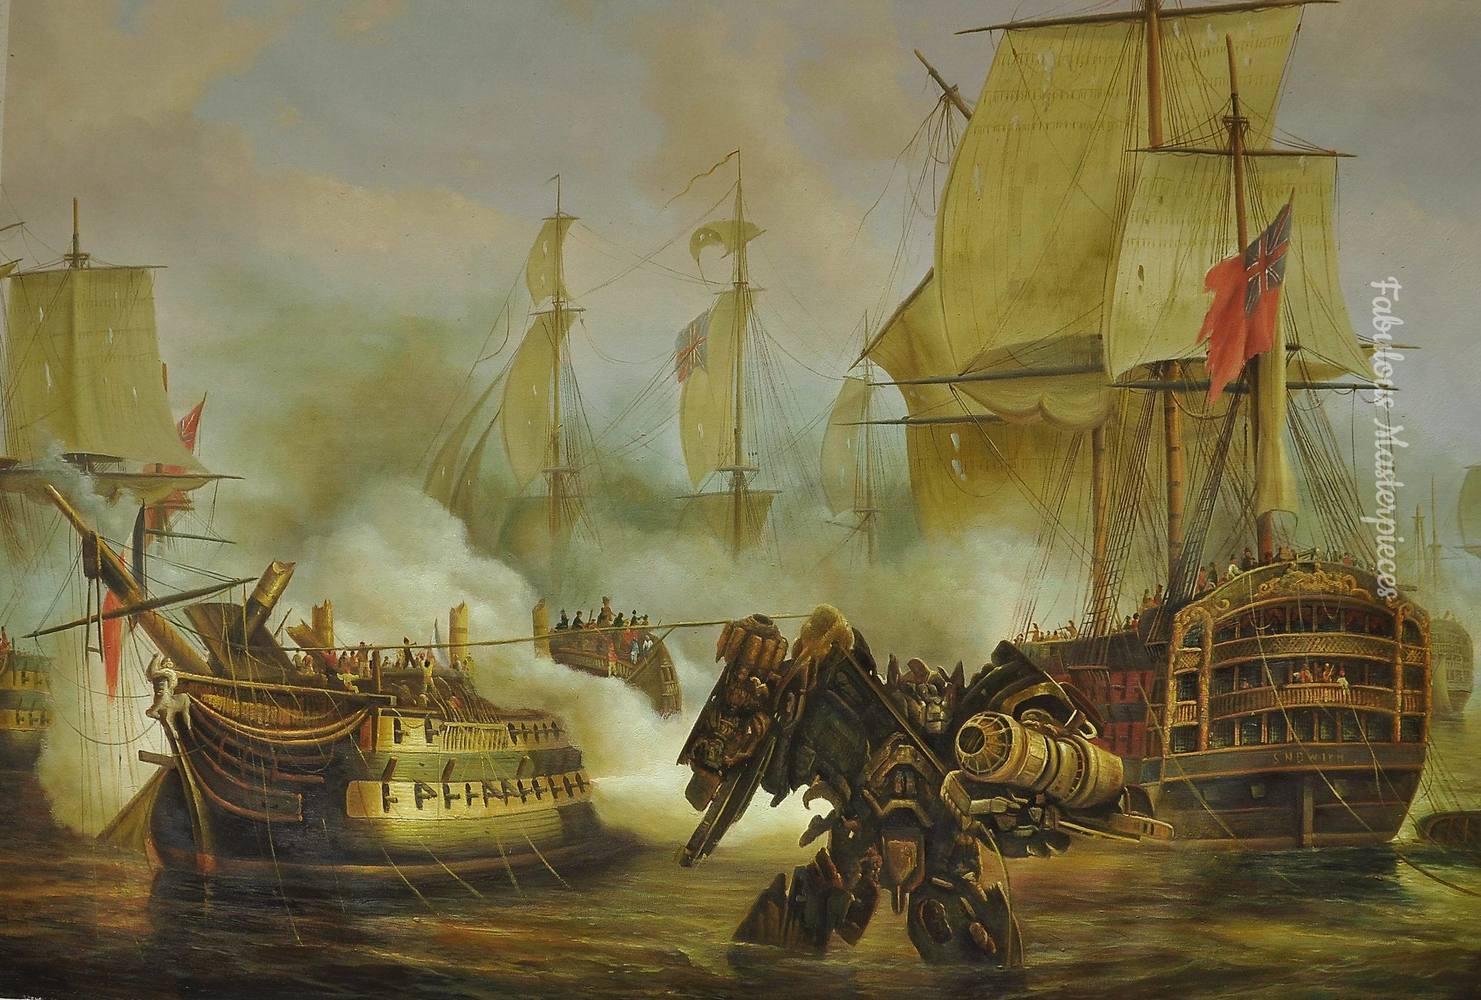 Transformer in Battle of Trafalgar